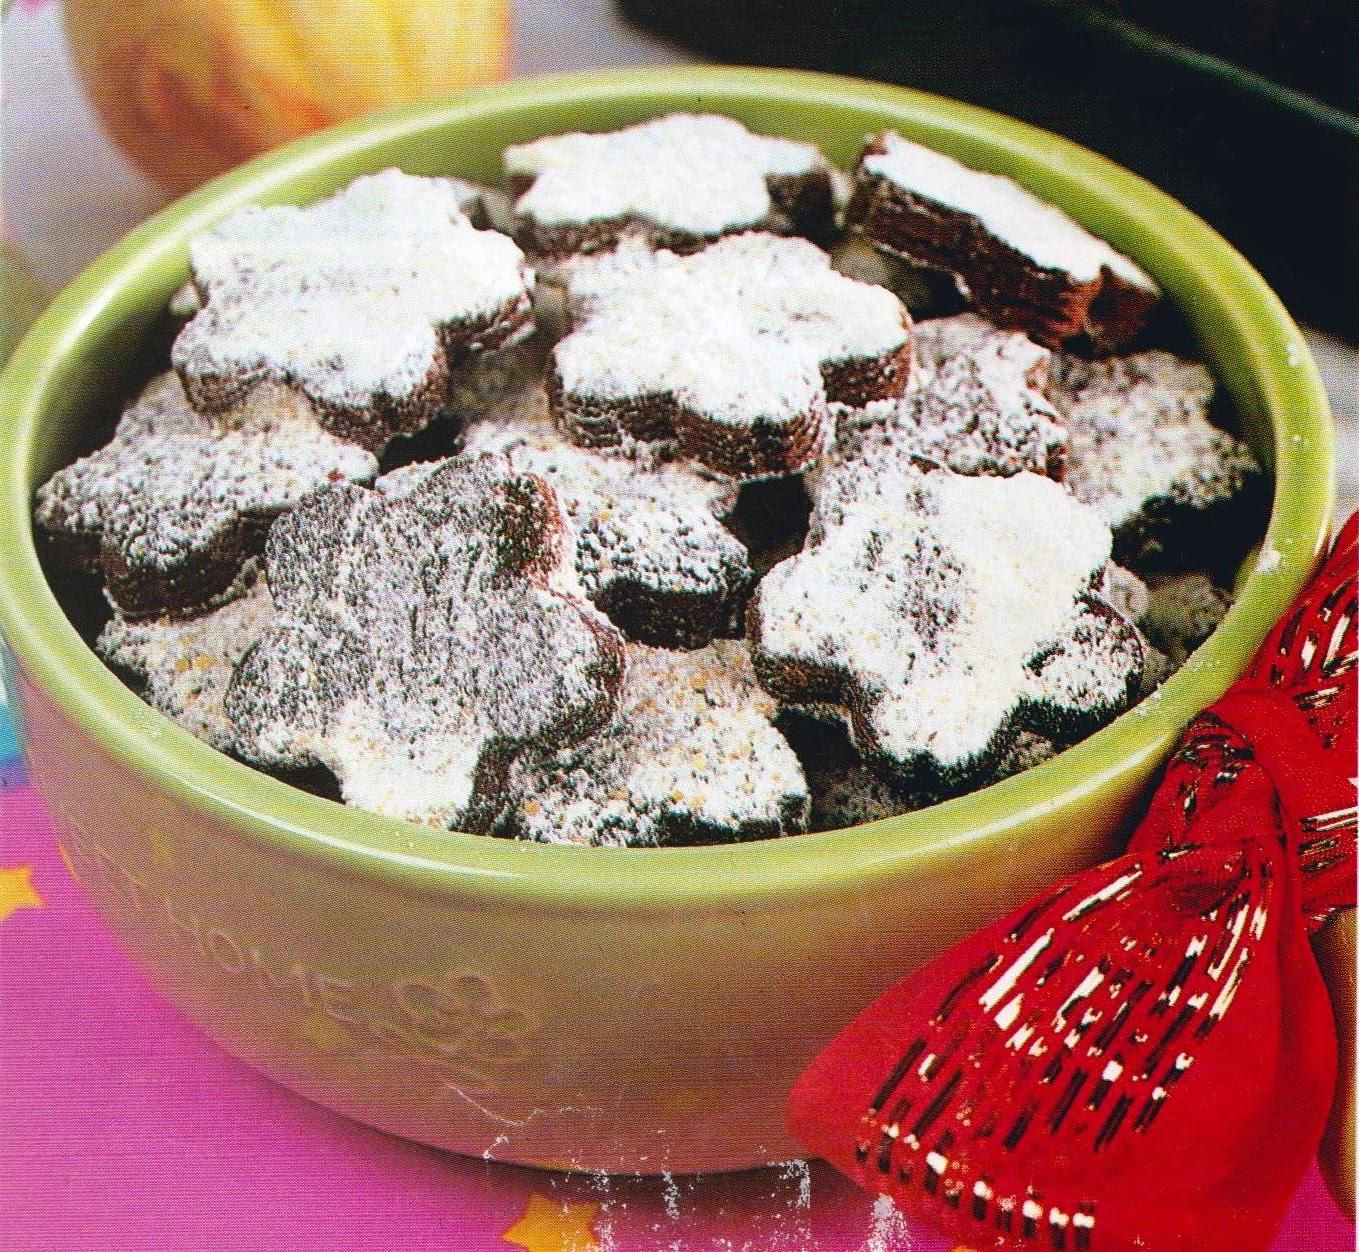 Resep Dan Cara Membuat Cookies Cokelat Tabur Kacang Hijau